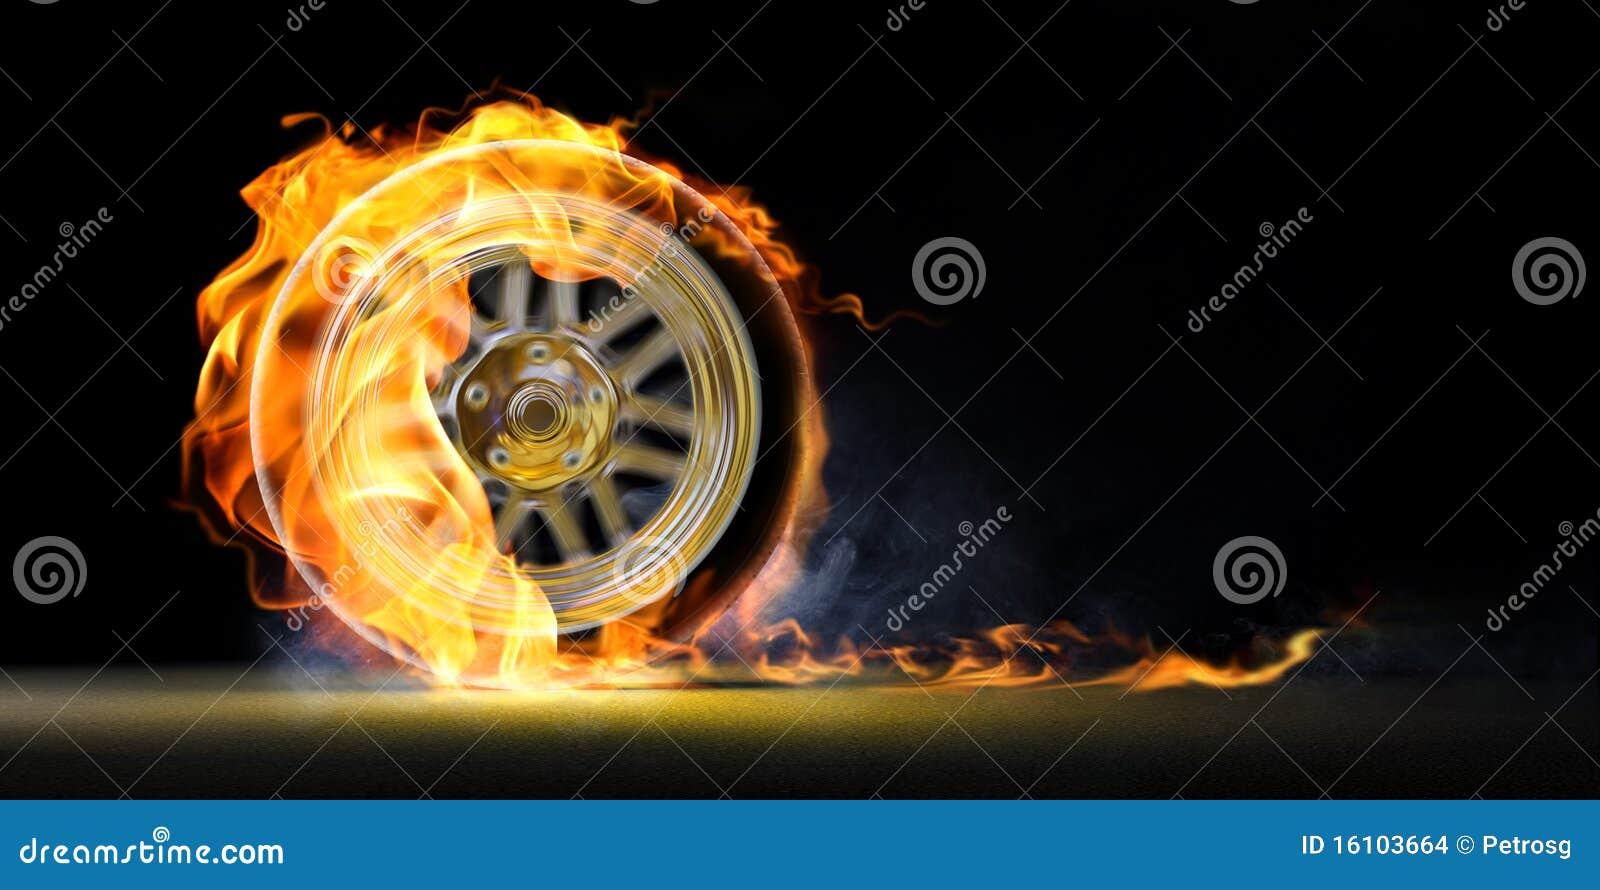 Car wheel on fire stock illustration. Image of road ...